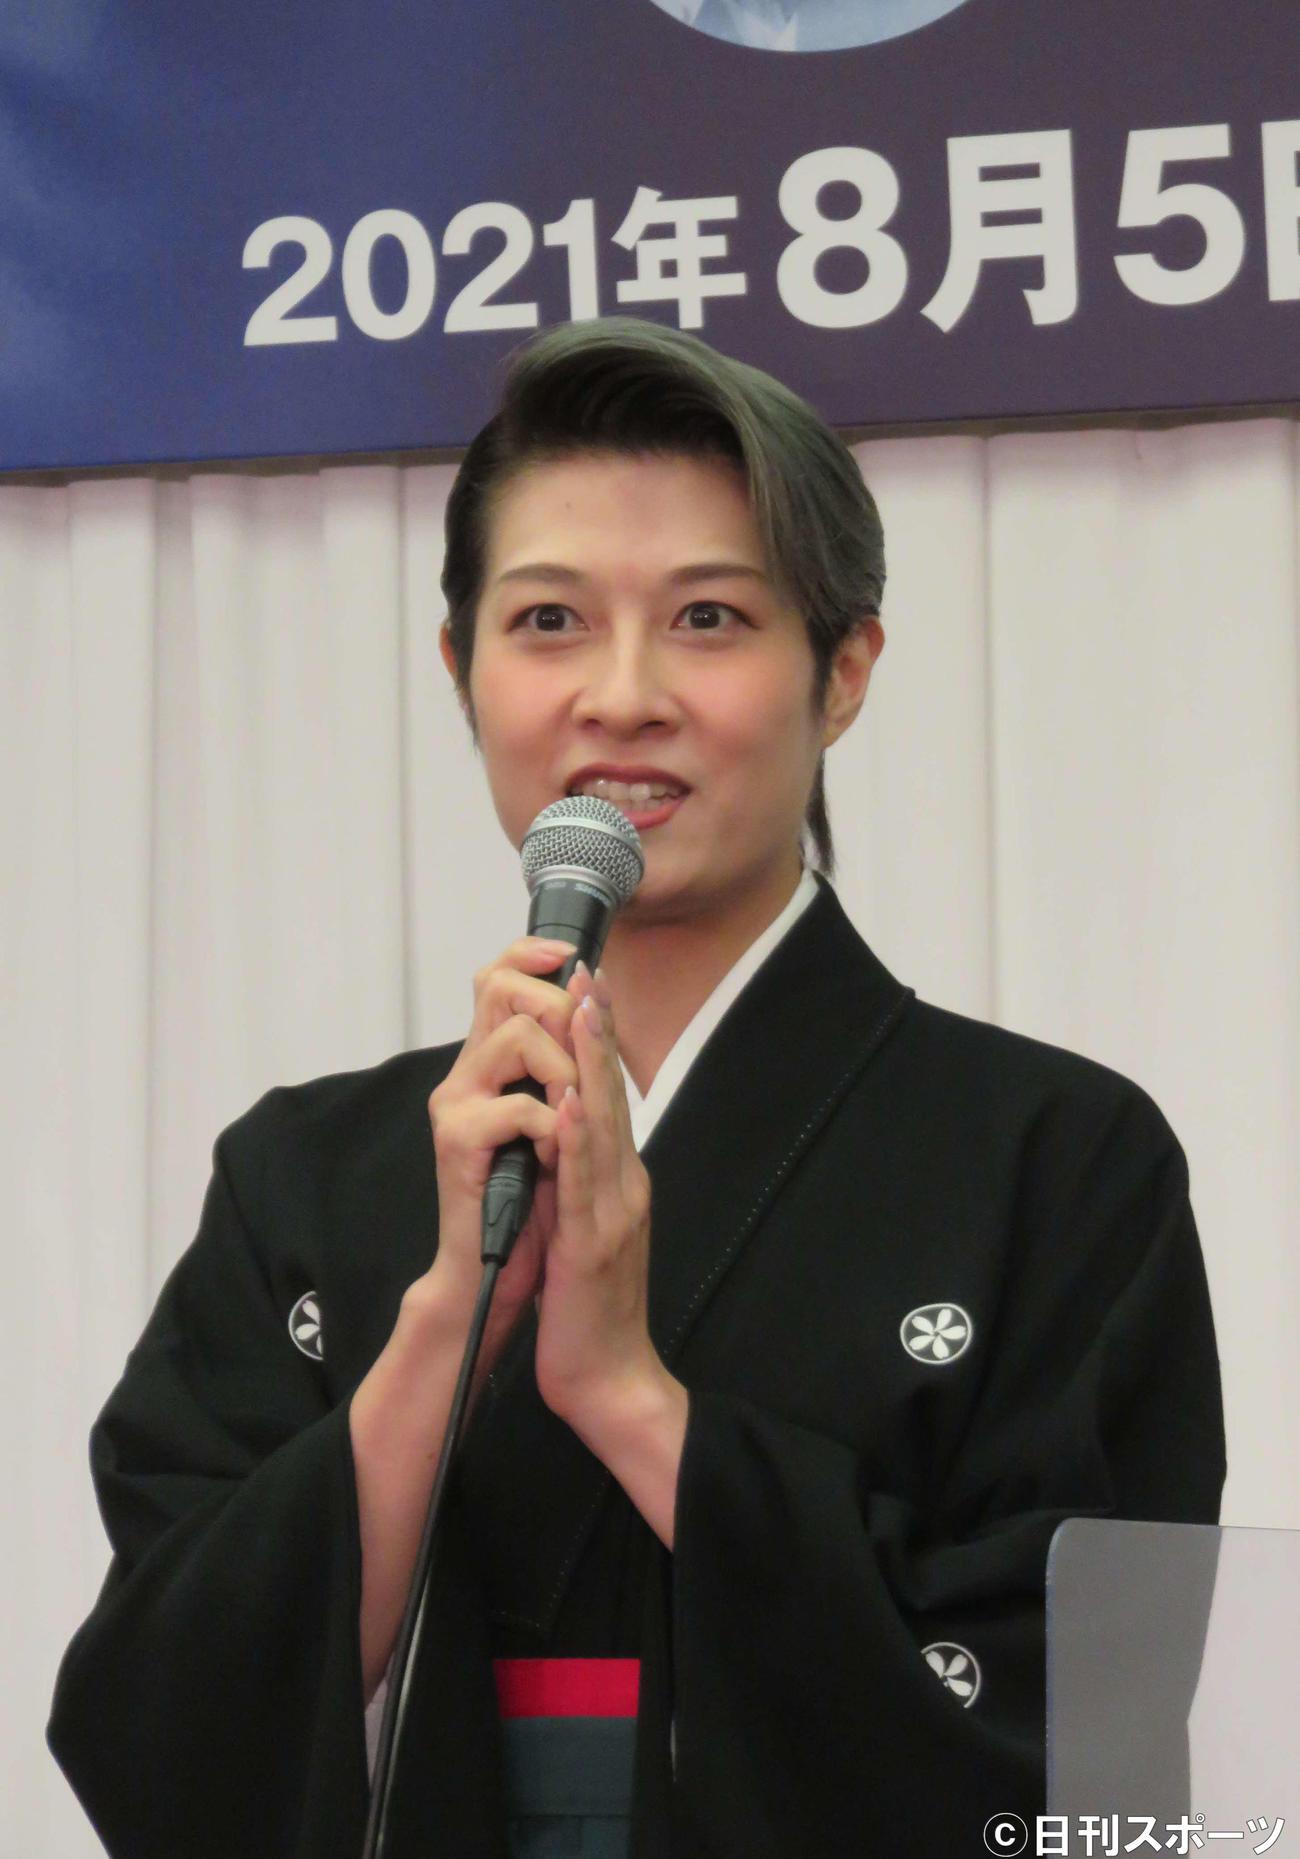 OSK日本歌劇団「レビュー夏のおどり『STARTt』」の制作会見に出席したトップスター楊琳